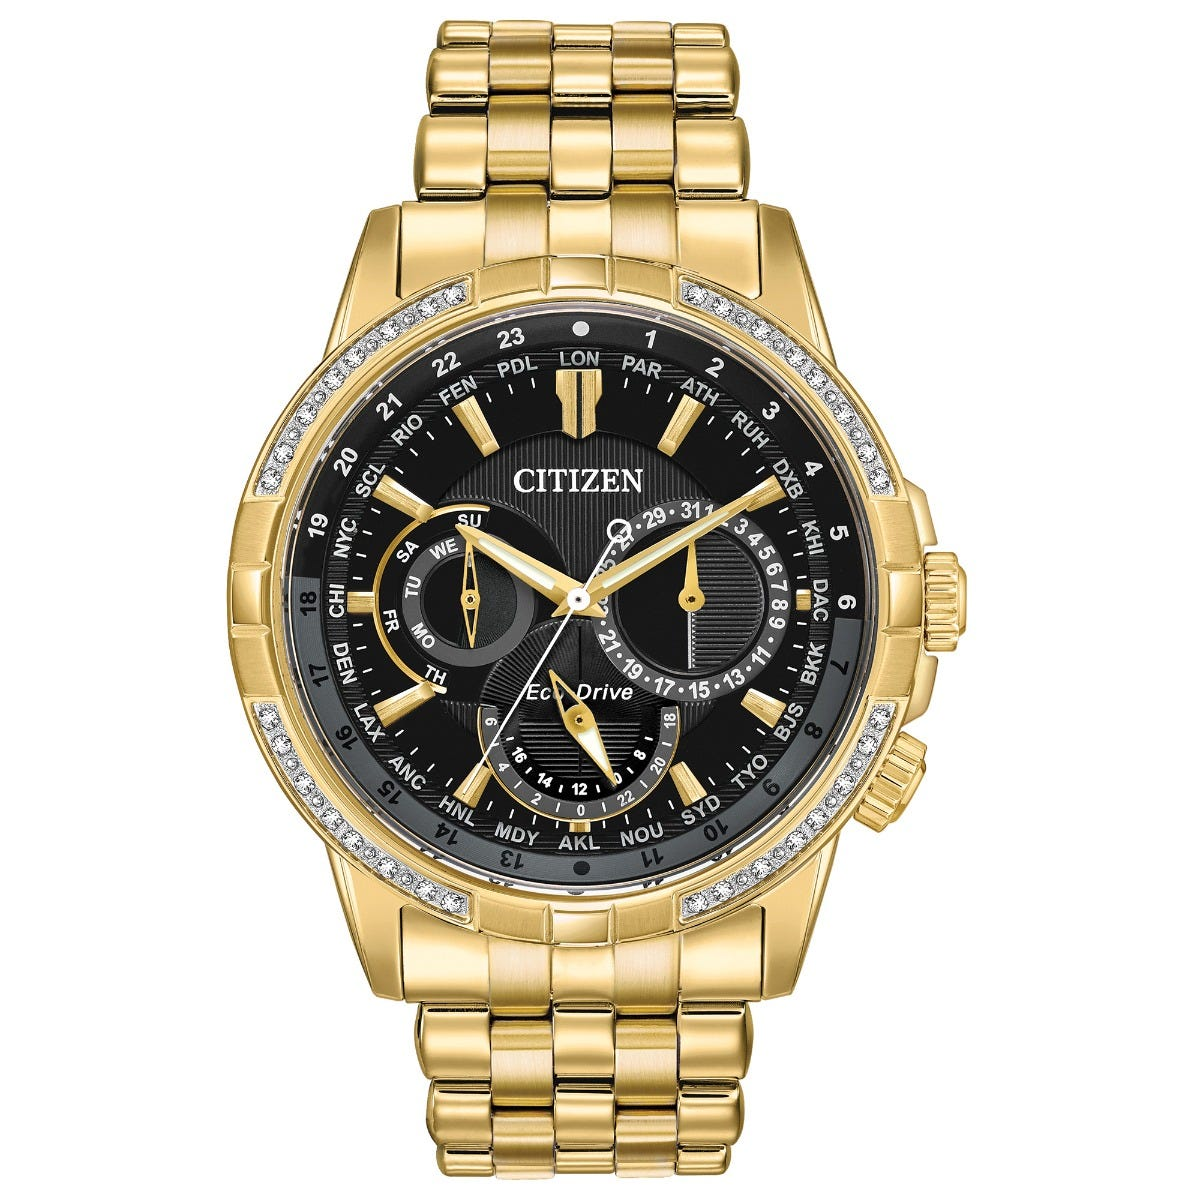 Citizen Eco-Drive® Calendrier Diamond Accent Gold-Tone Watch with Black Dial BU2082-56E